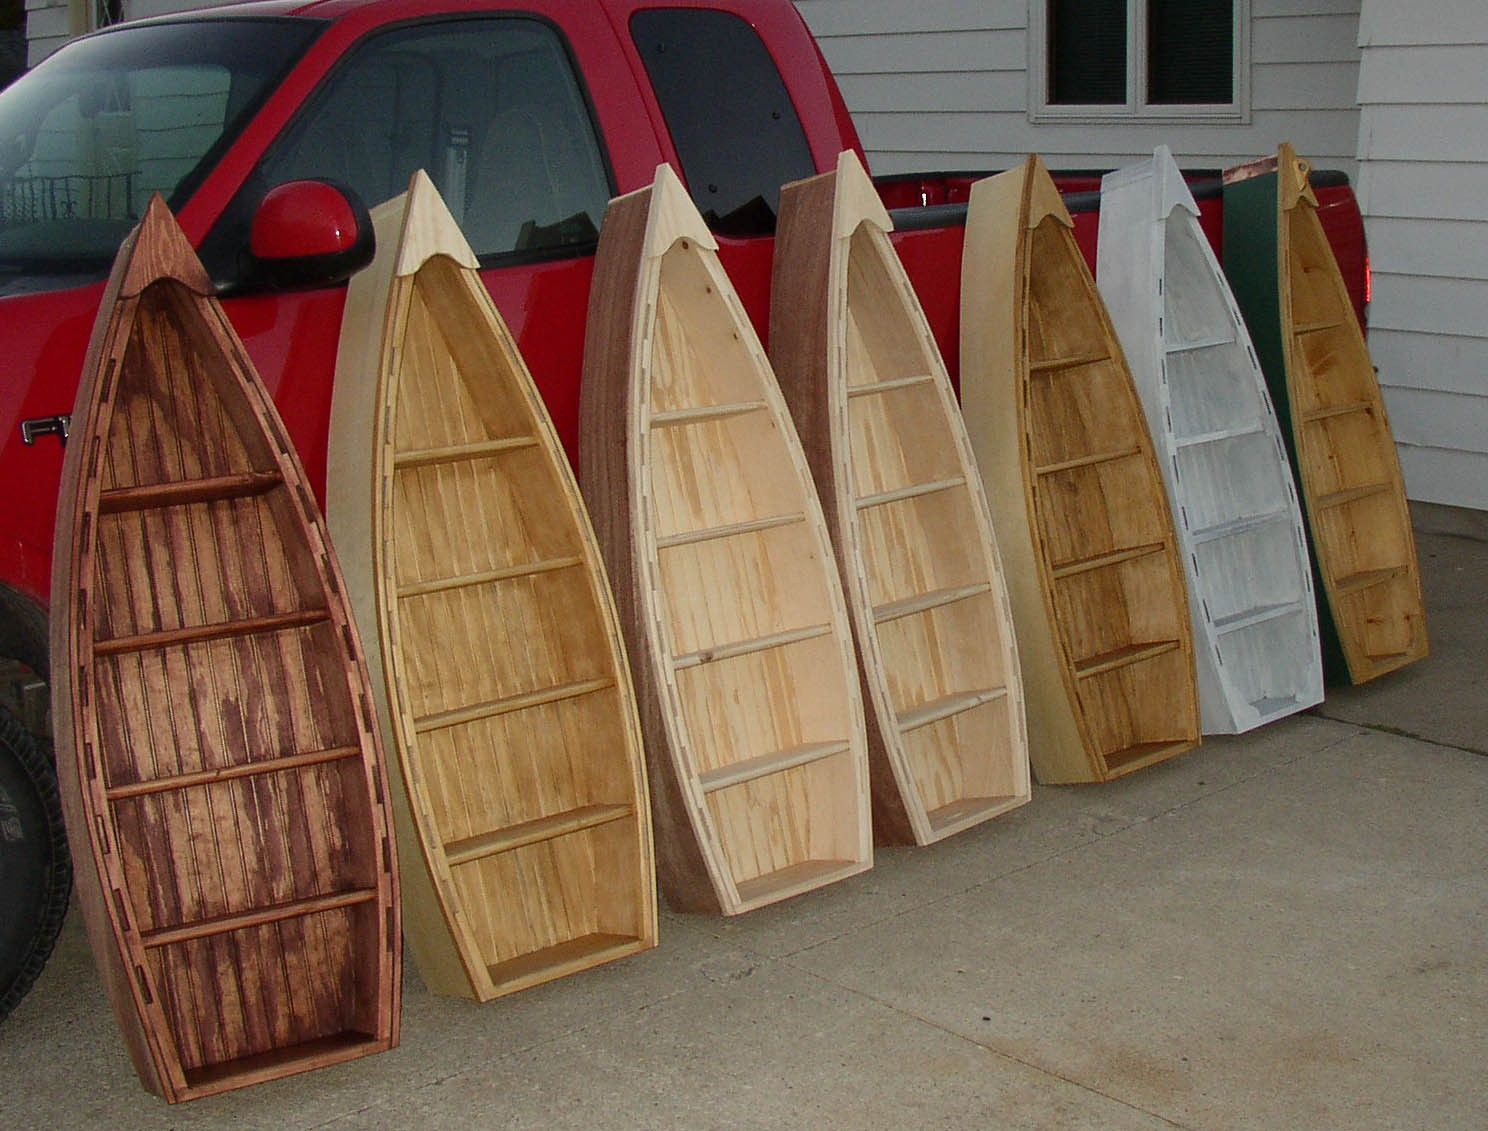 DIY Wood Boat Shelf Plans PDF Download little girl loft bed plans « ajar67ymm